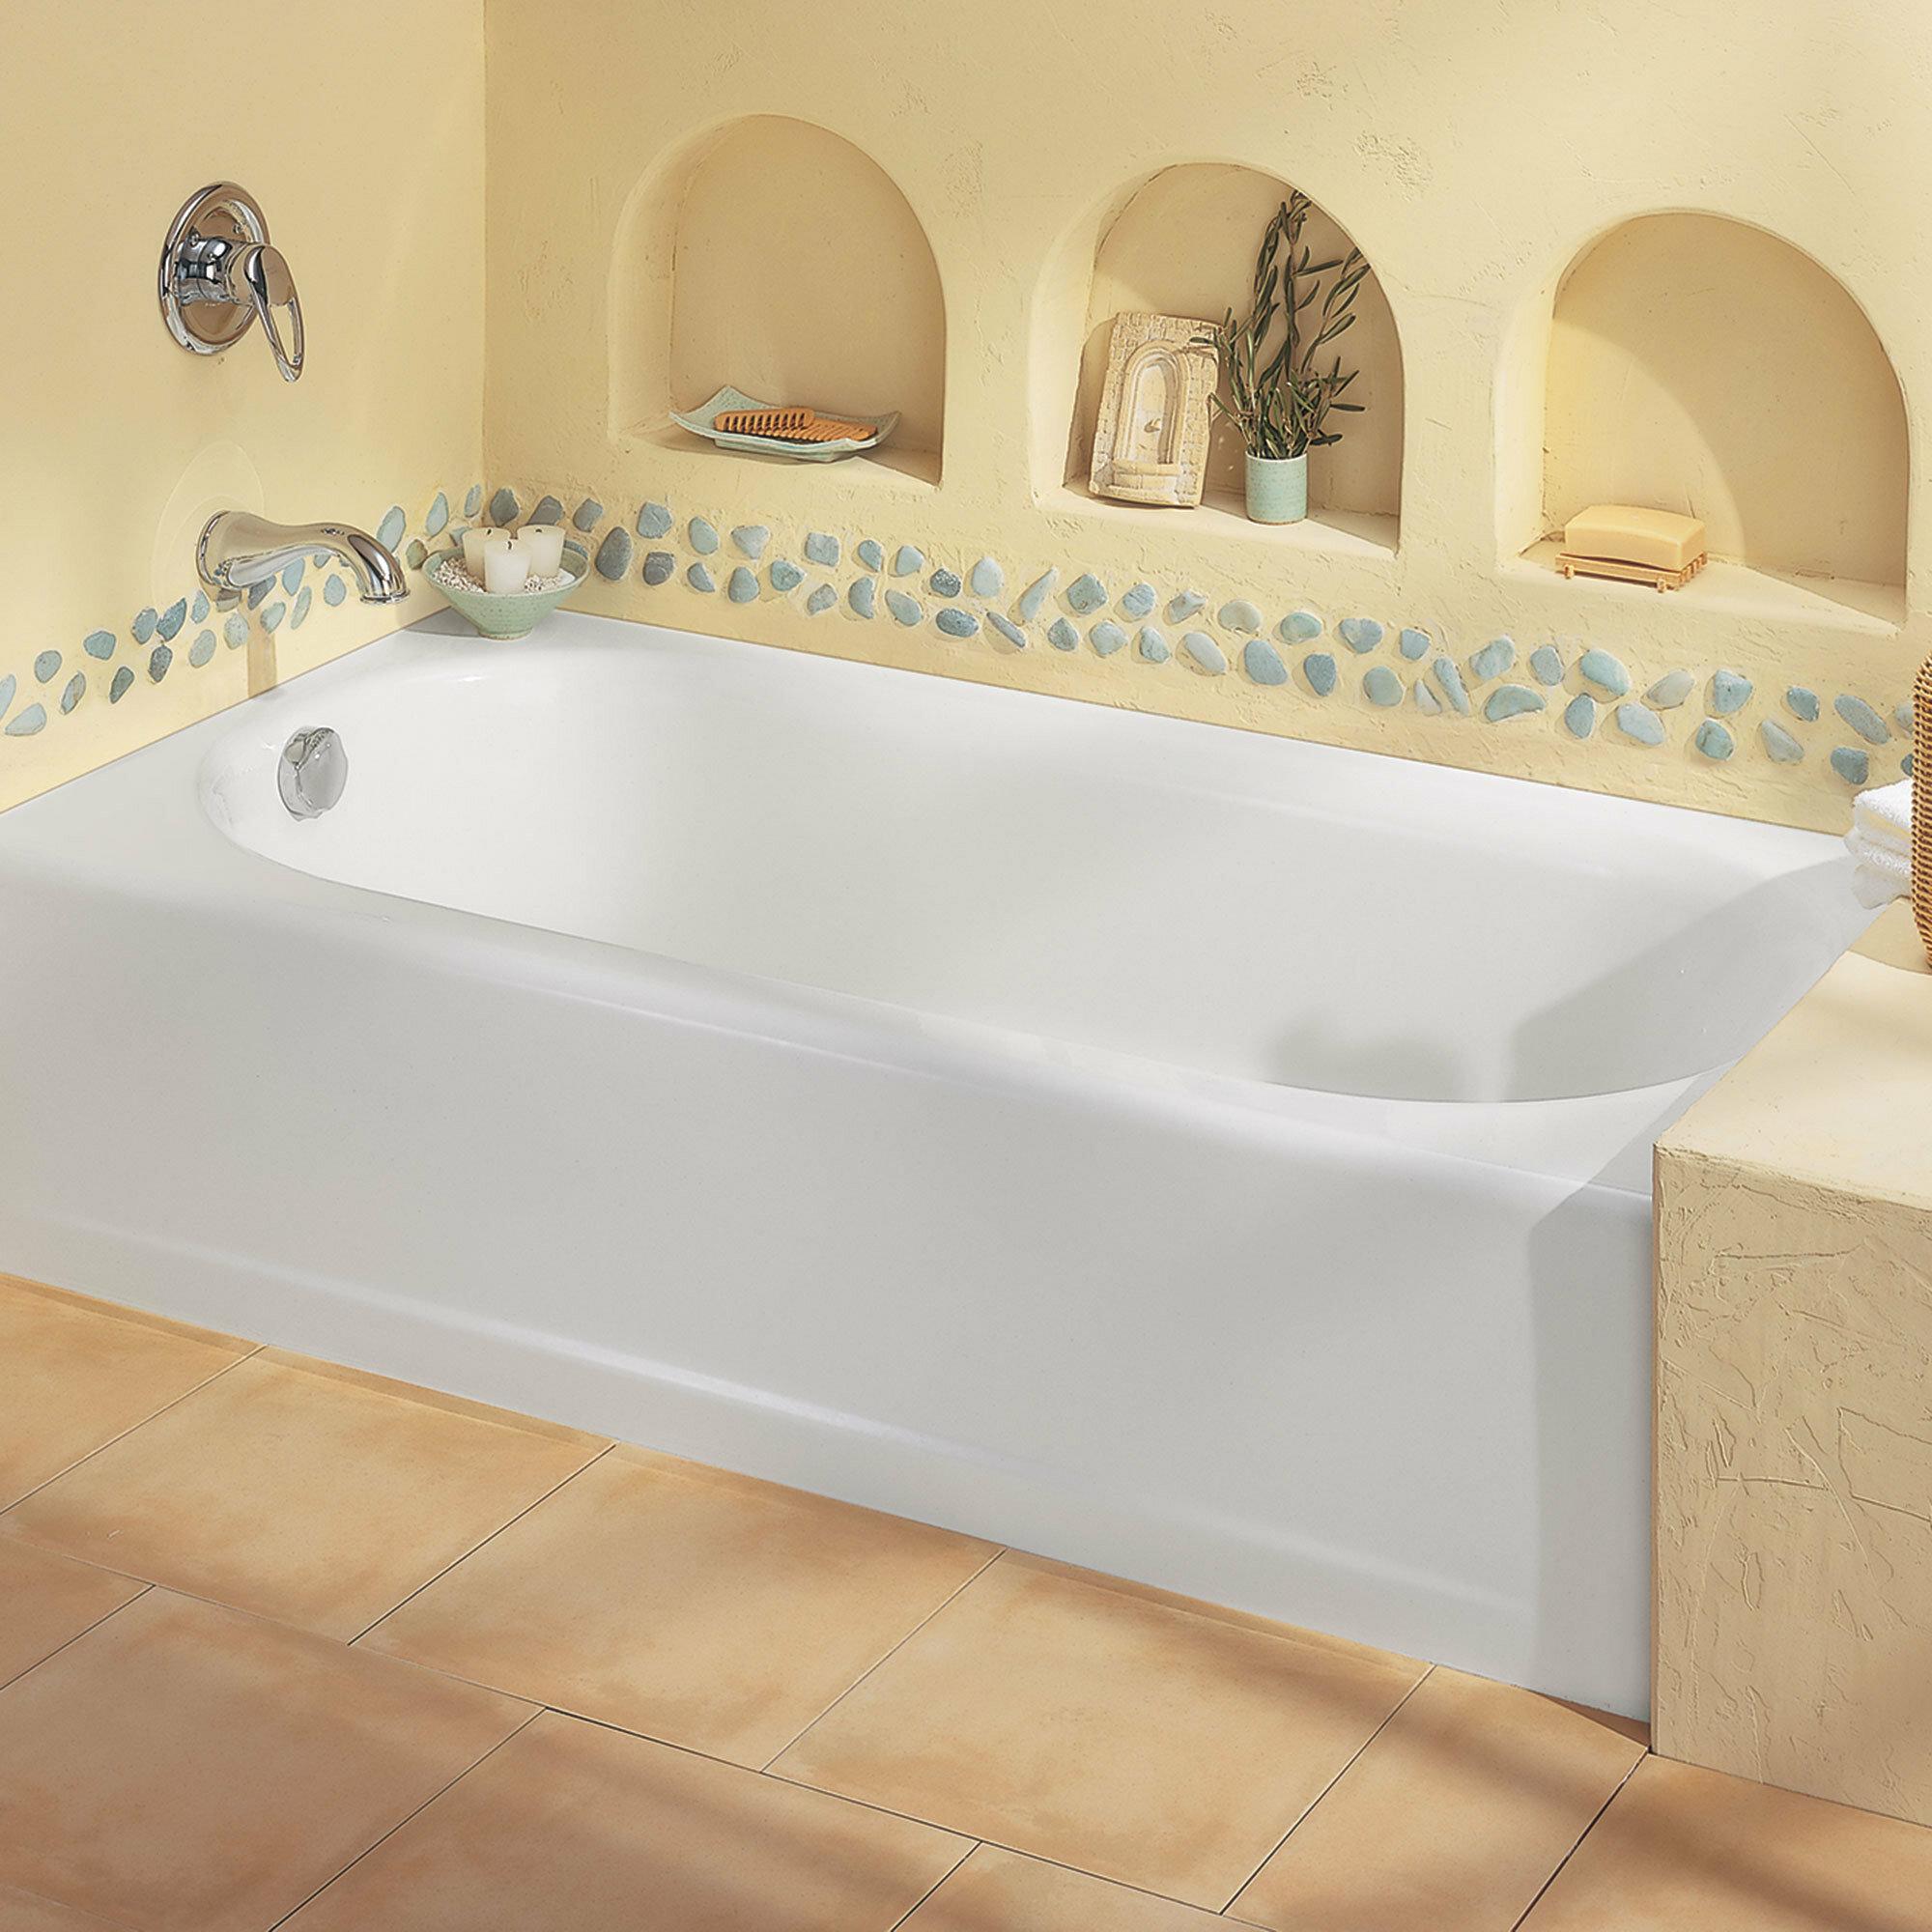 American Standard Princeton 60 X 30 Alcove Soaking Bathtub Reviews Wayfair